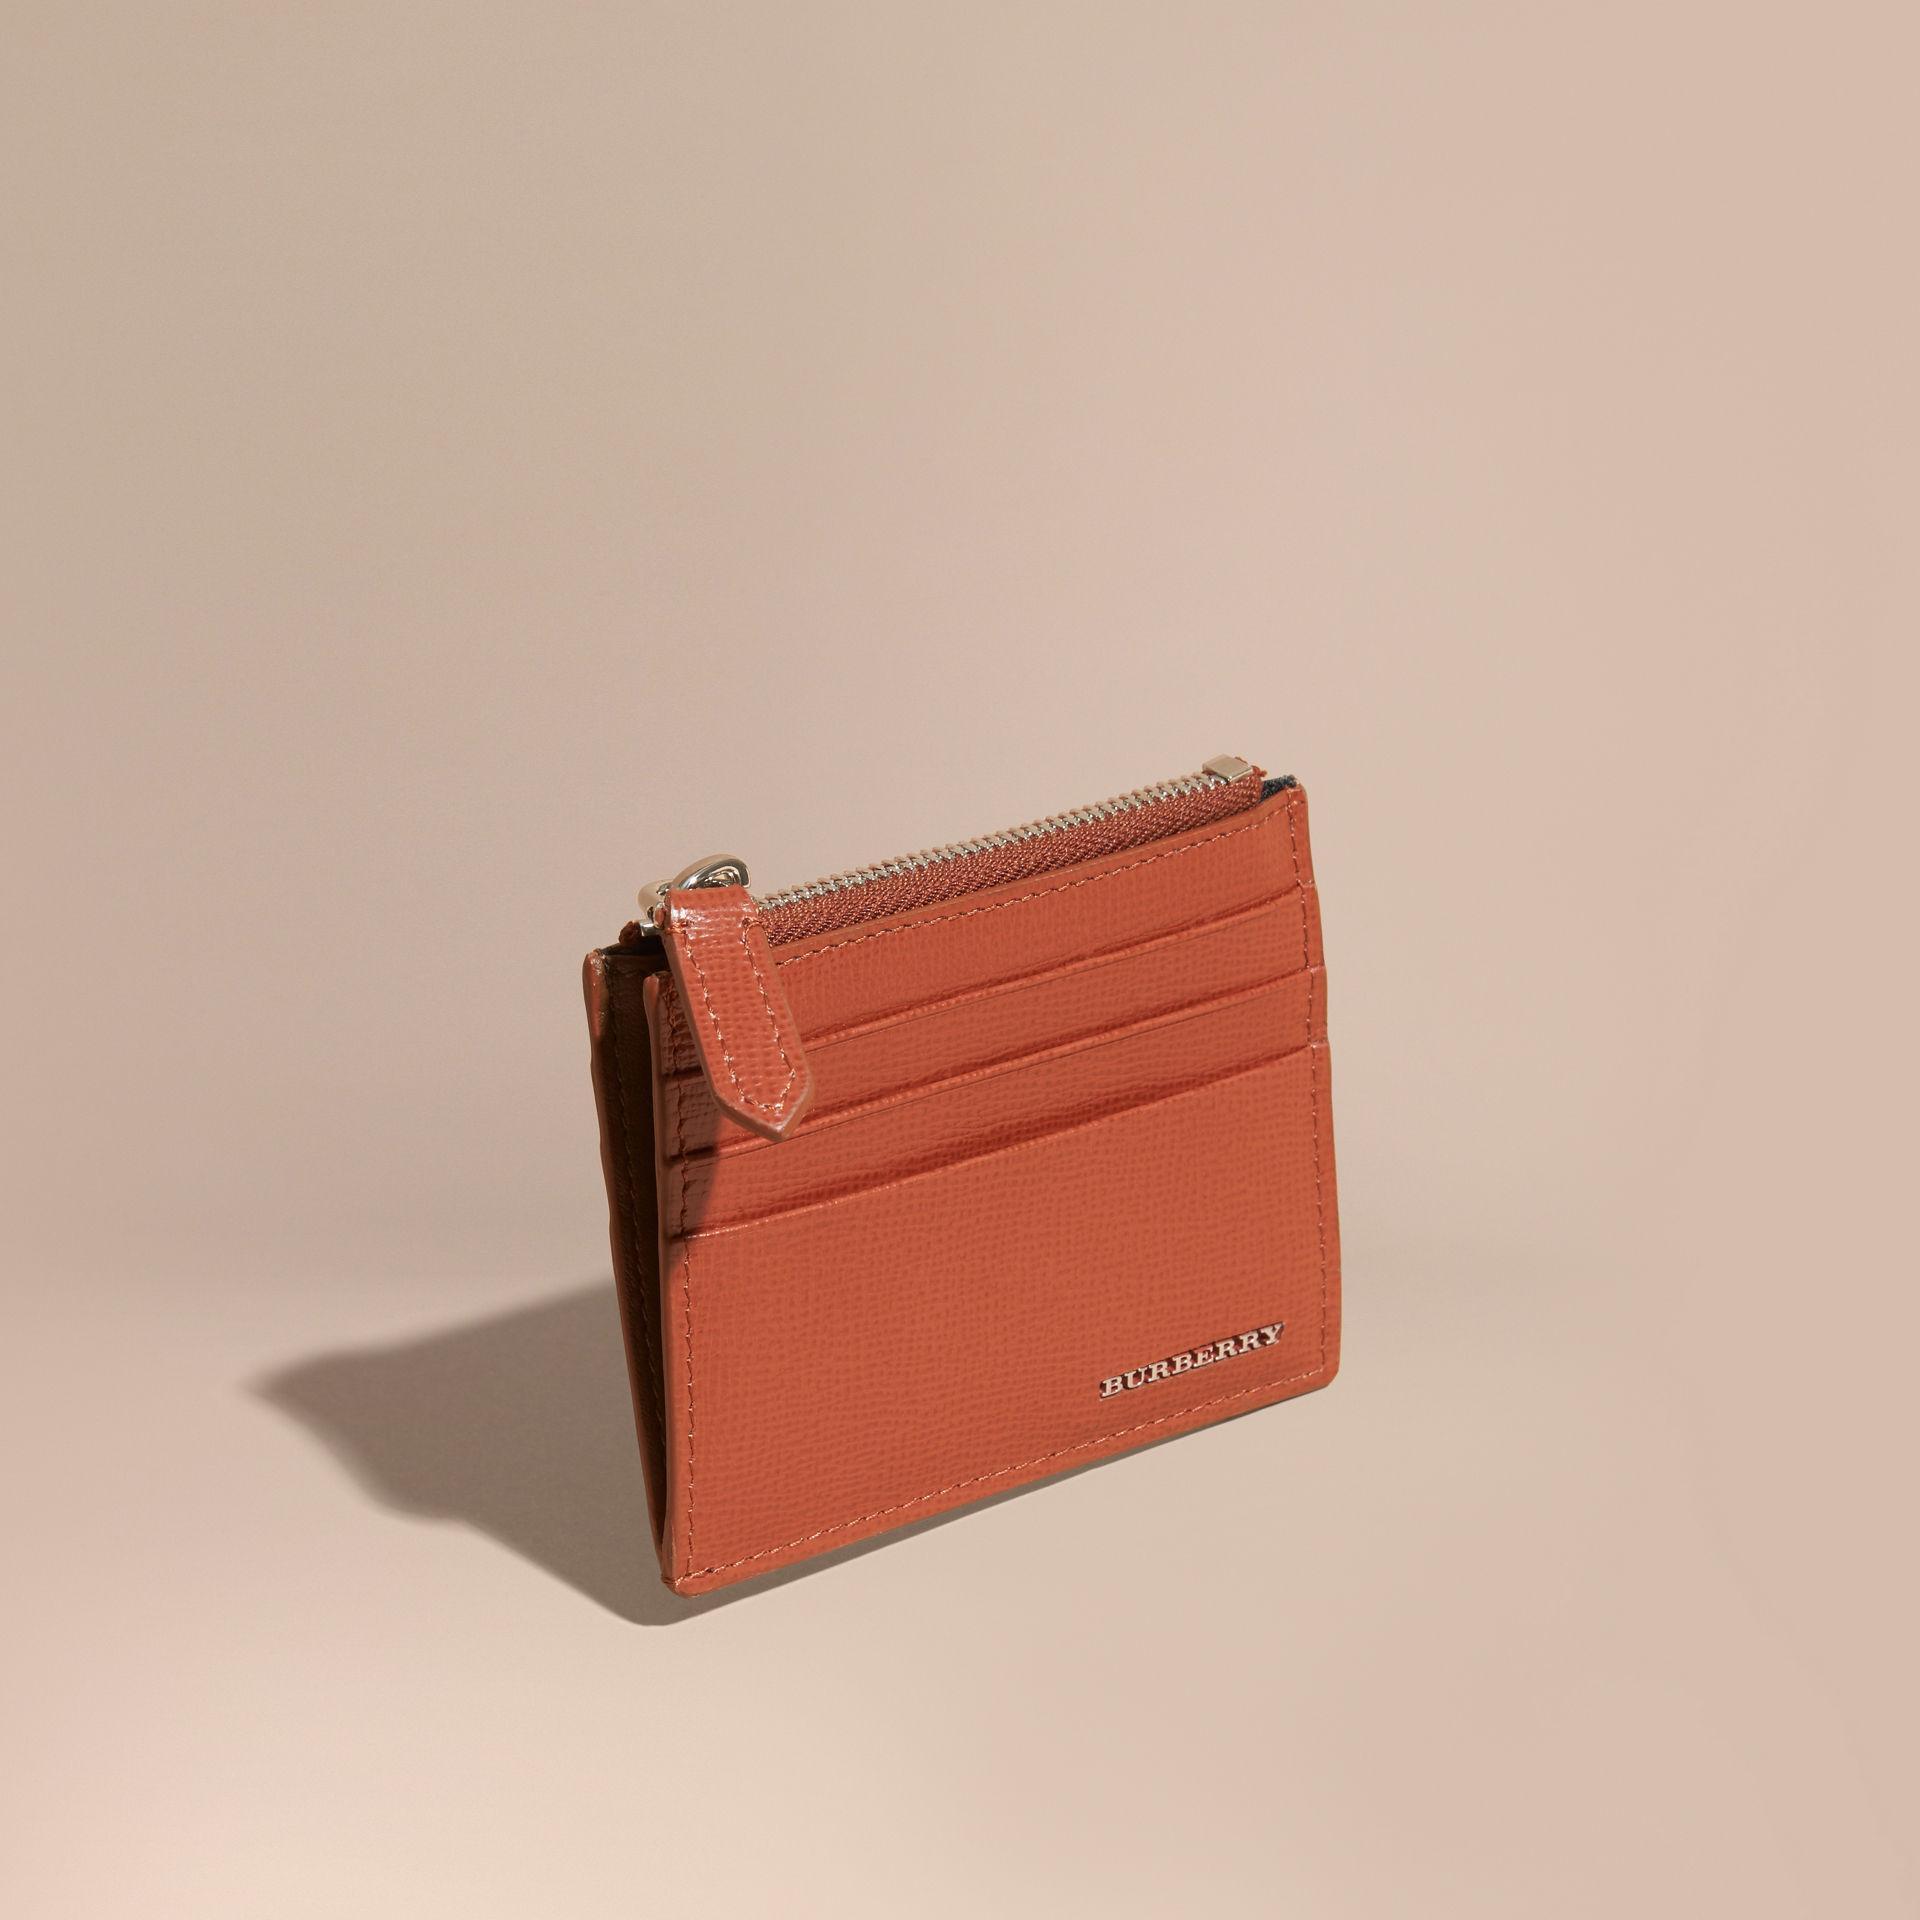 san francisco 4df07 8c0f2 Burberry Multicolor London Leather Zip-top Card Case Burnt Sienna